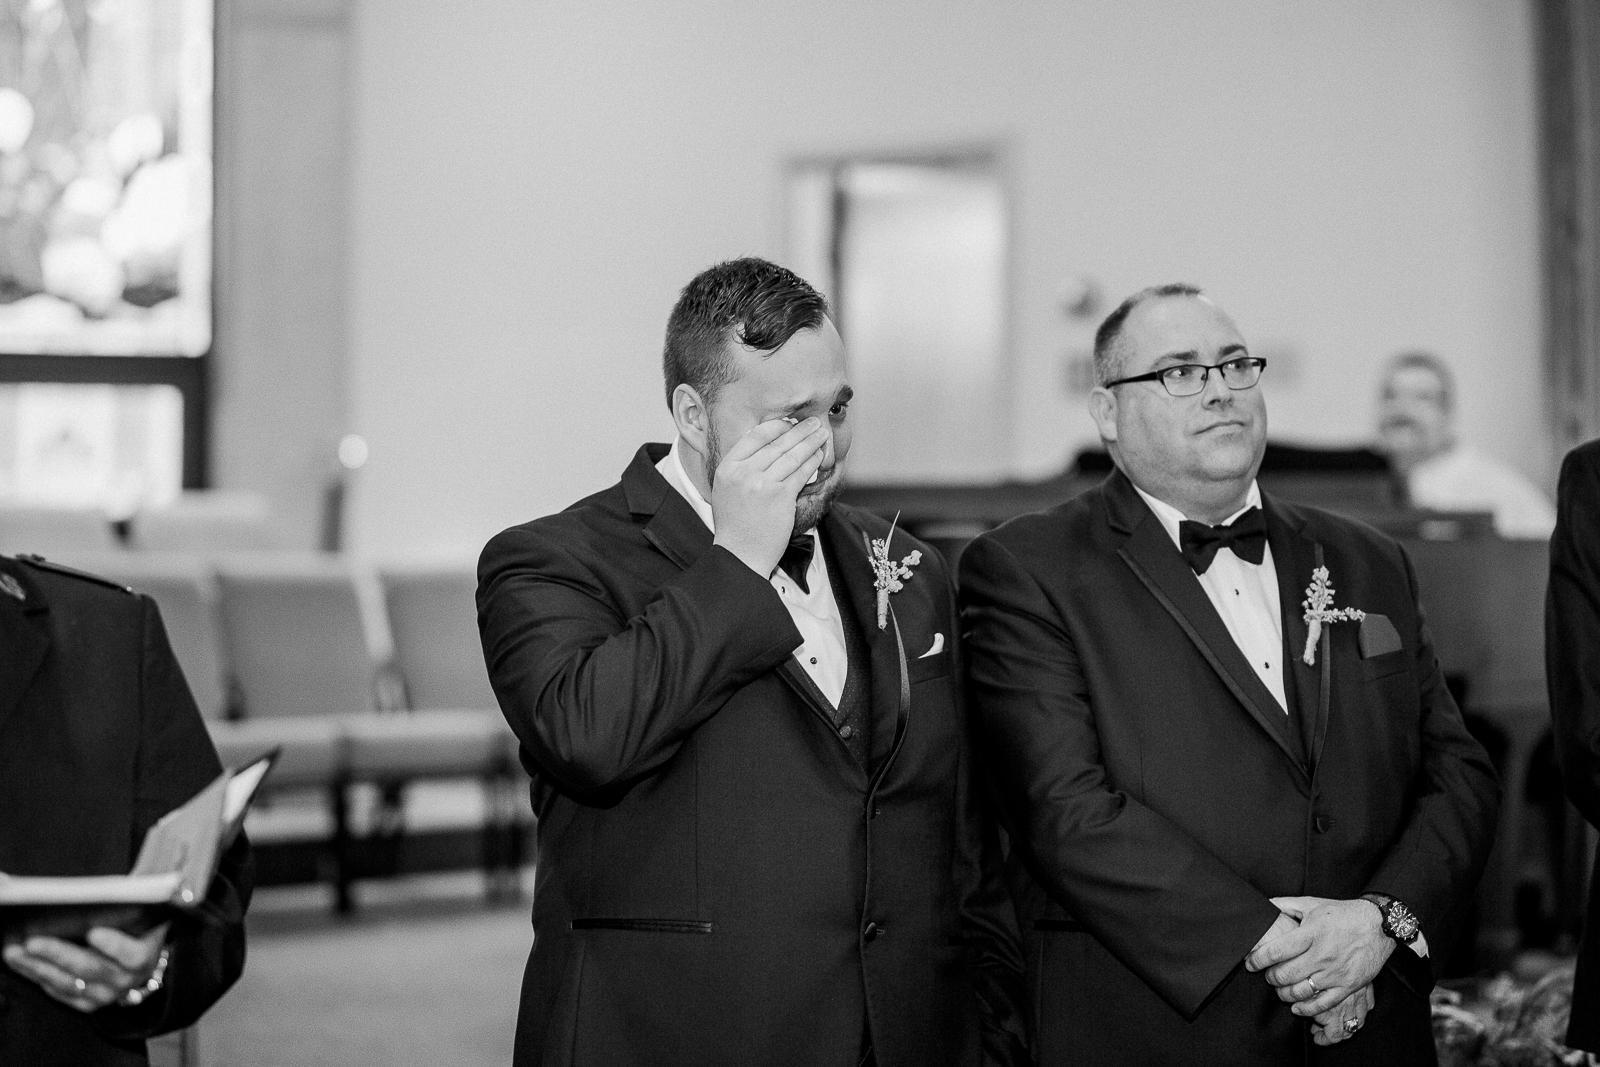 gander-wedding-photographer-44.jpg